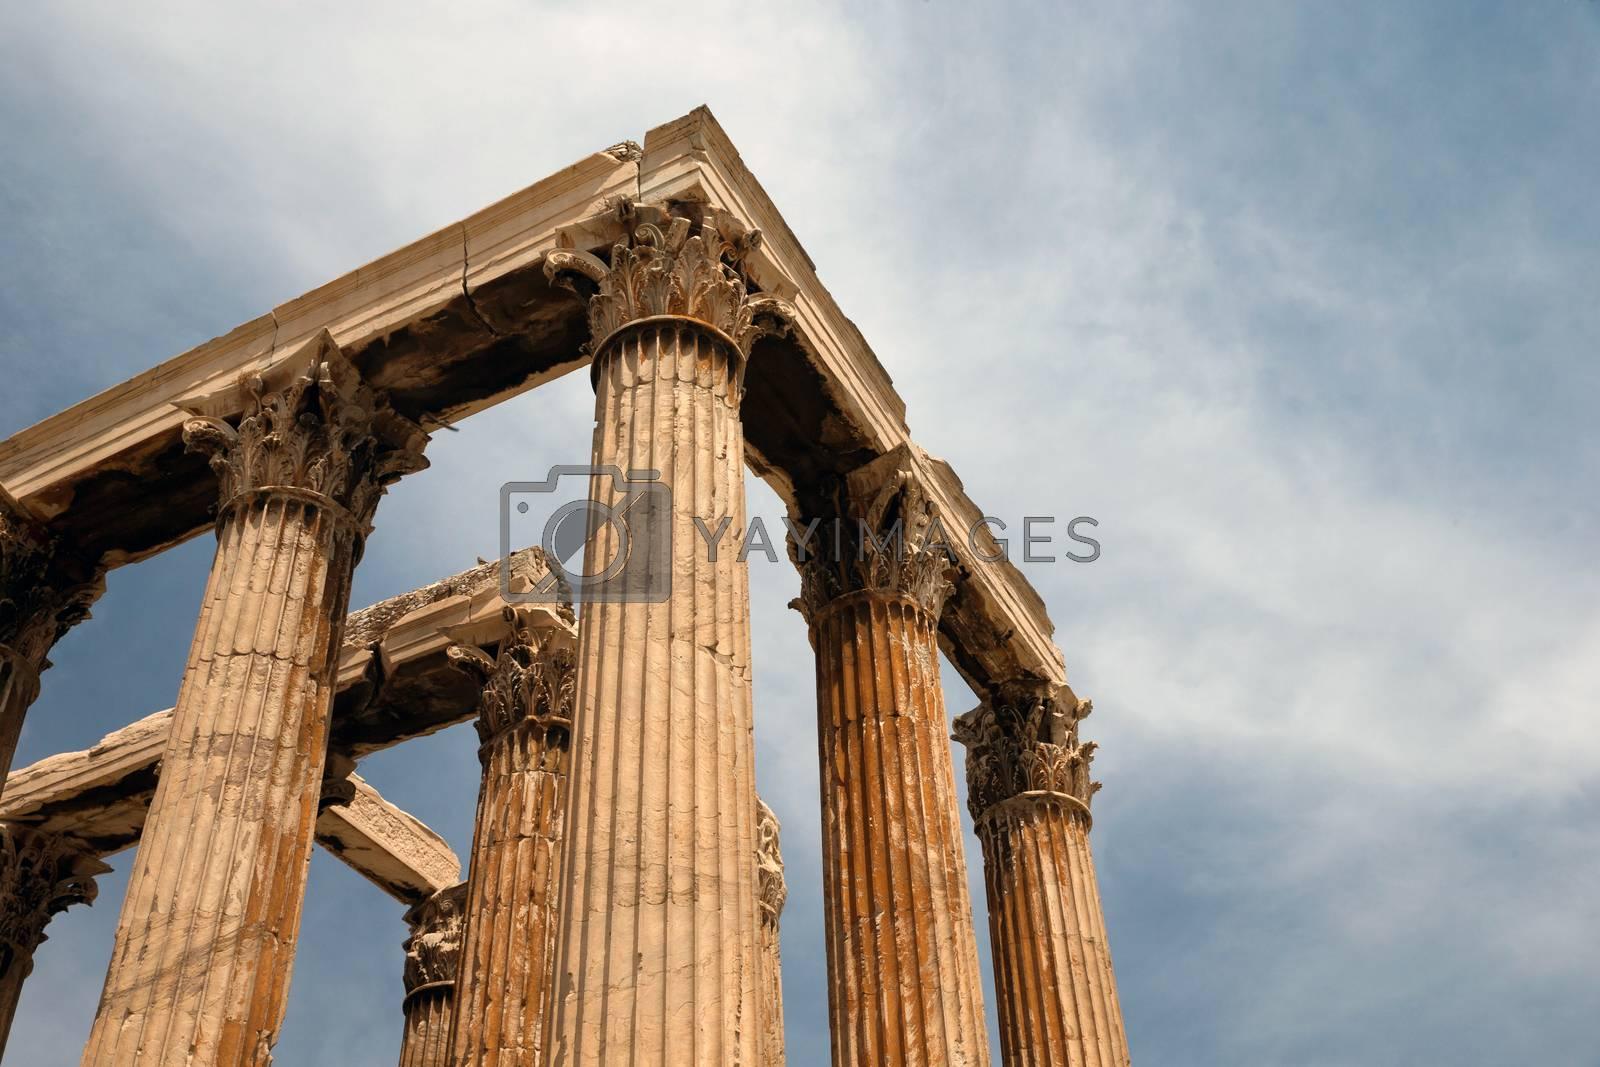 Temple of Olympian Zeus  by Pakhnyushchyy